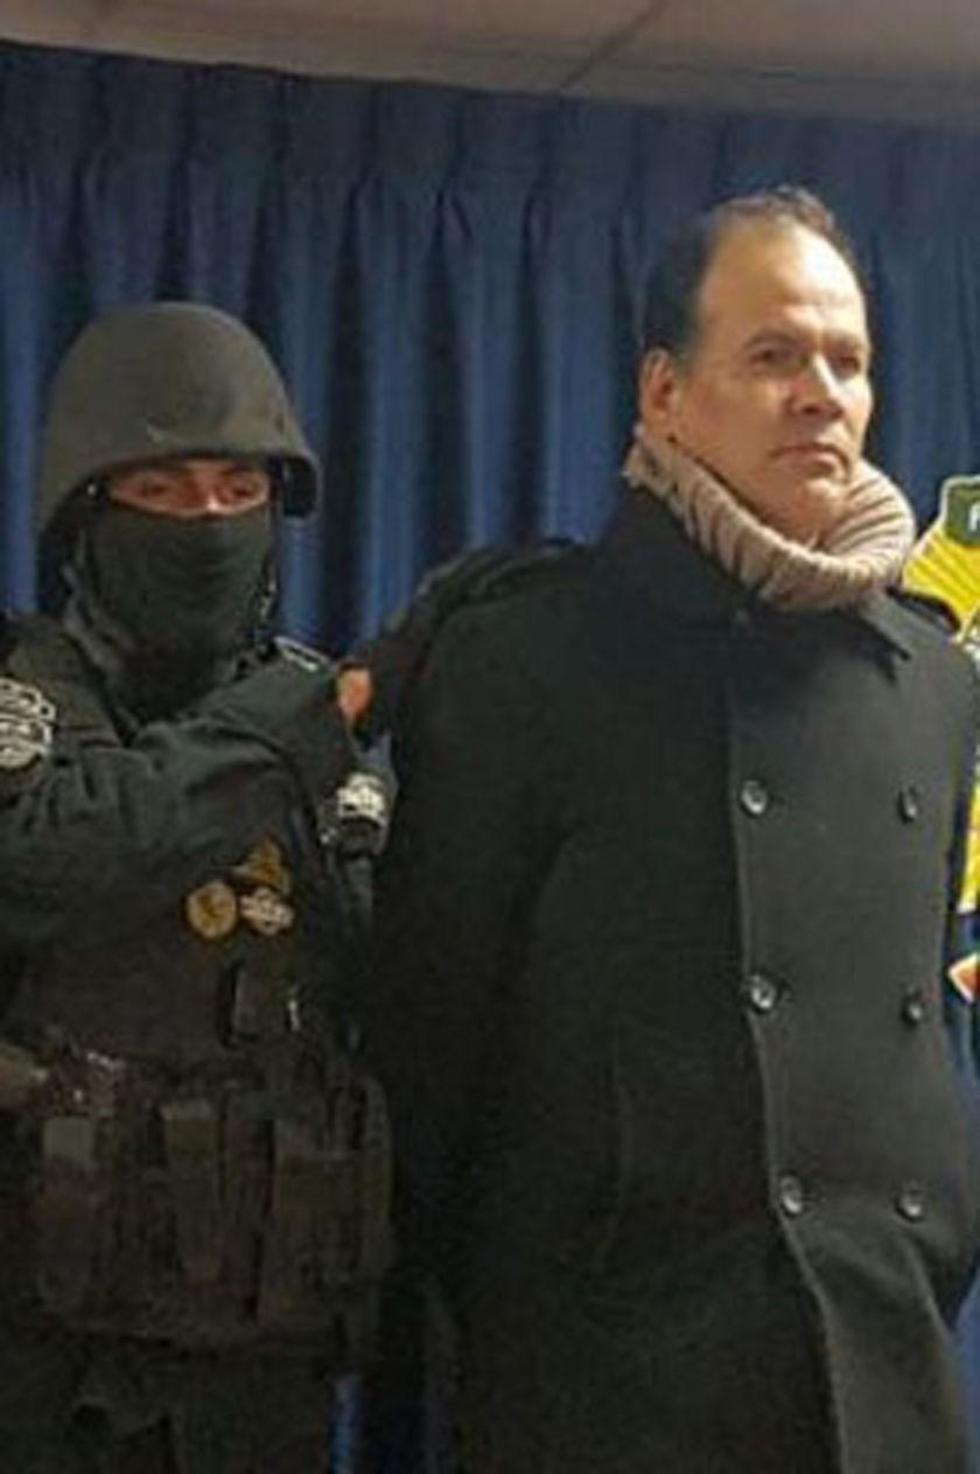 Envían a la cárcel a presunto líder de la guerrilla peruana